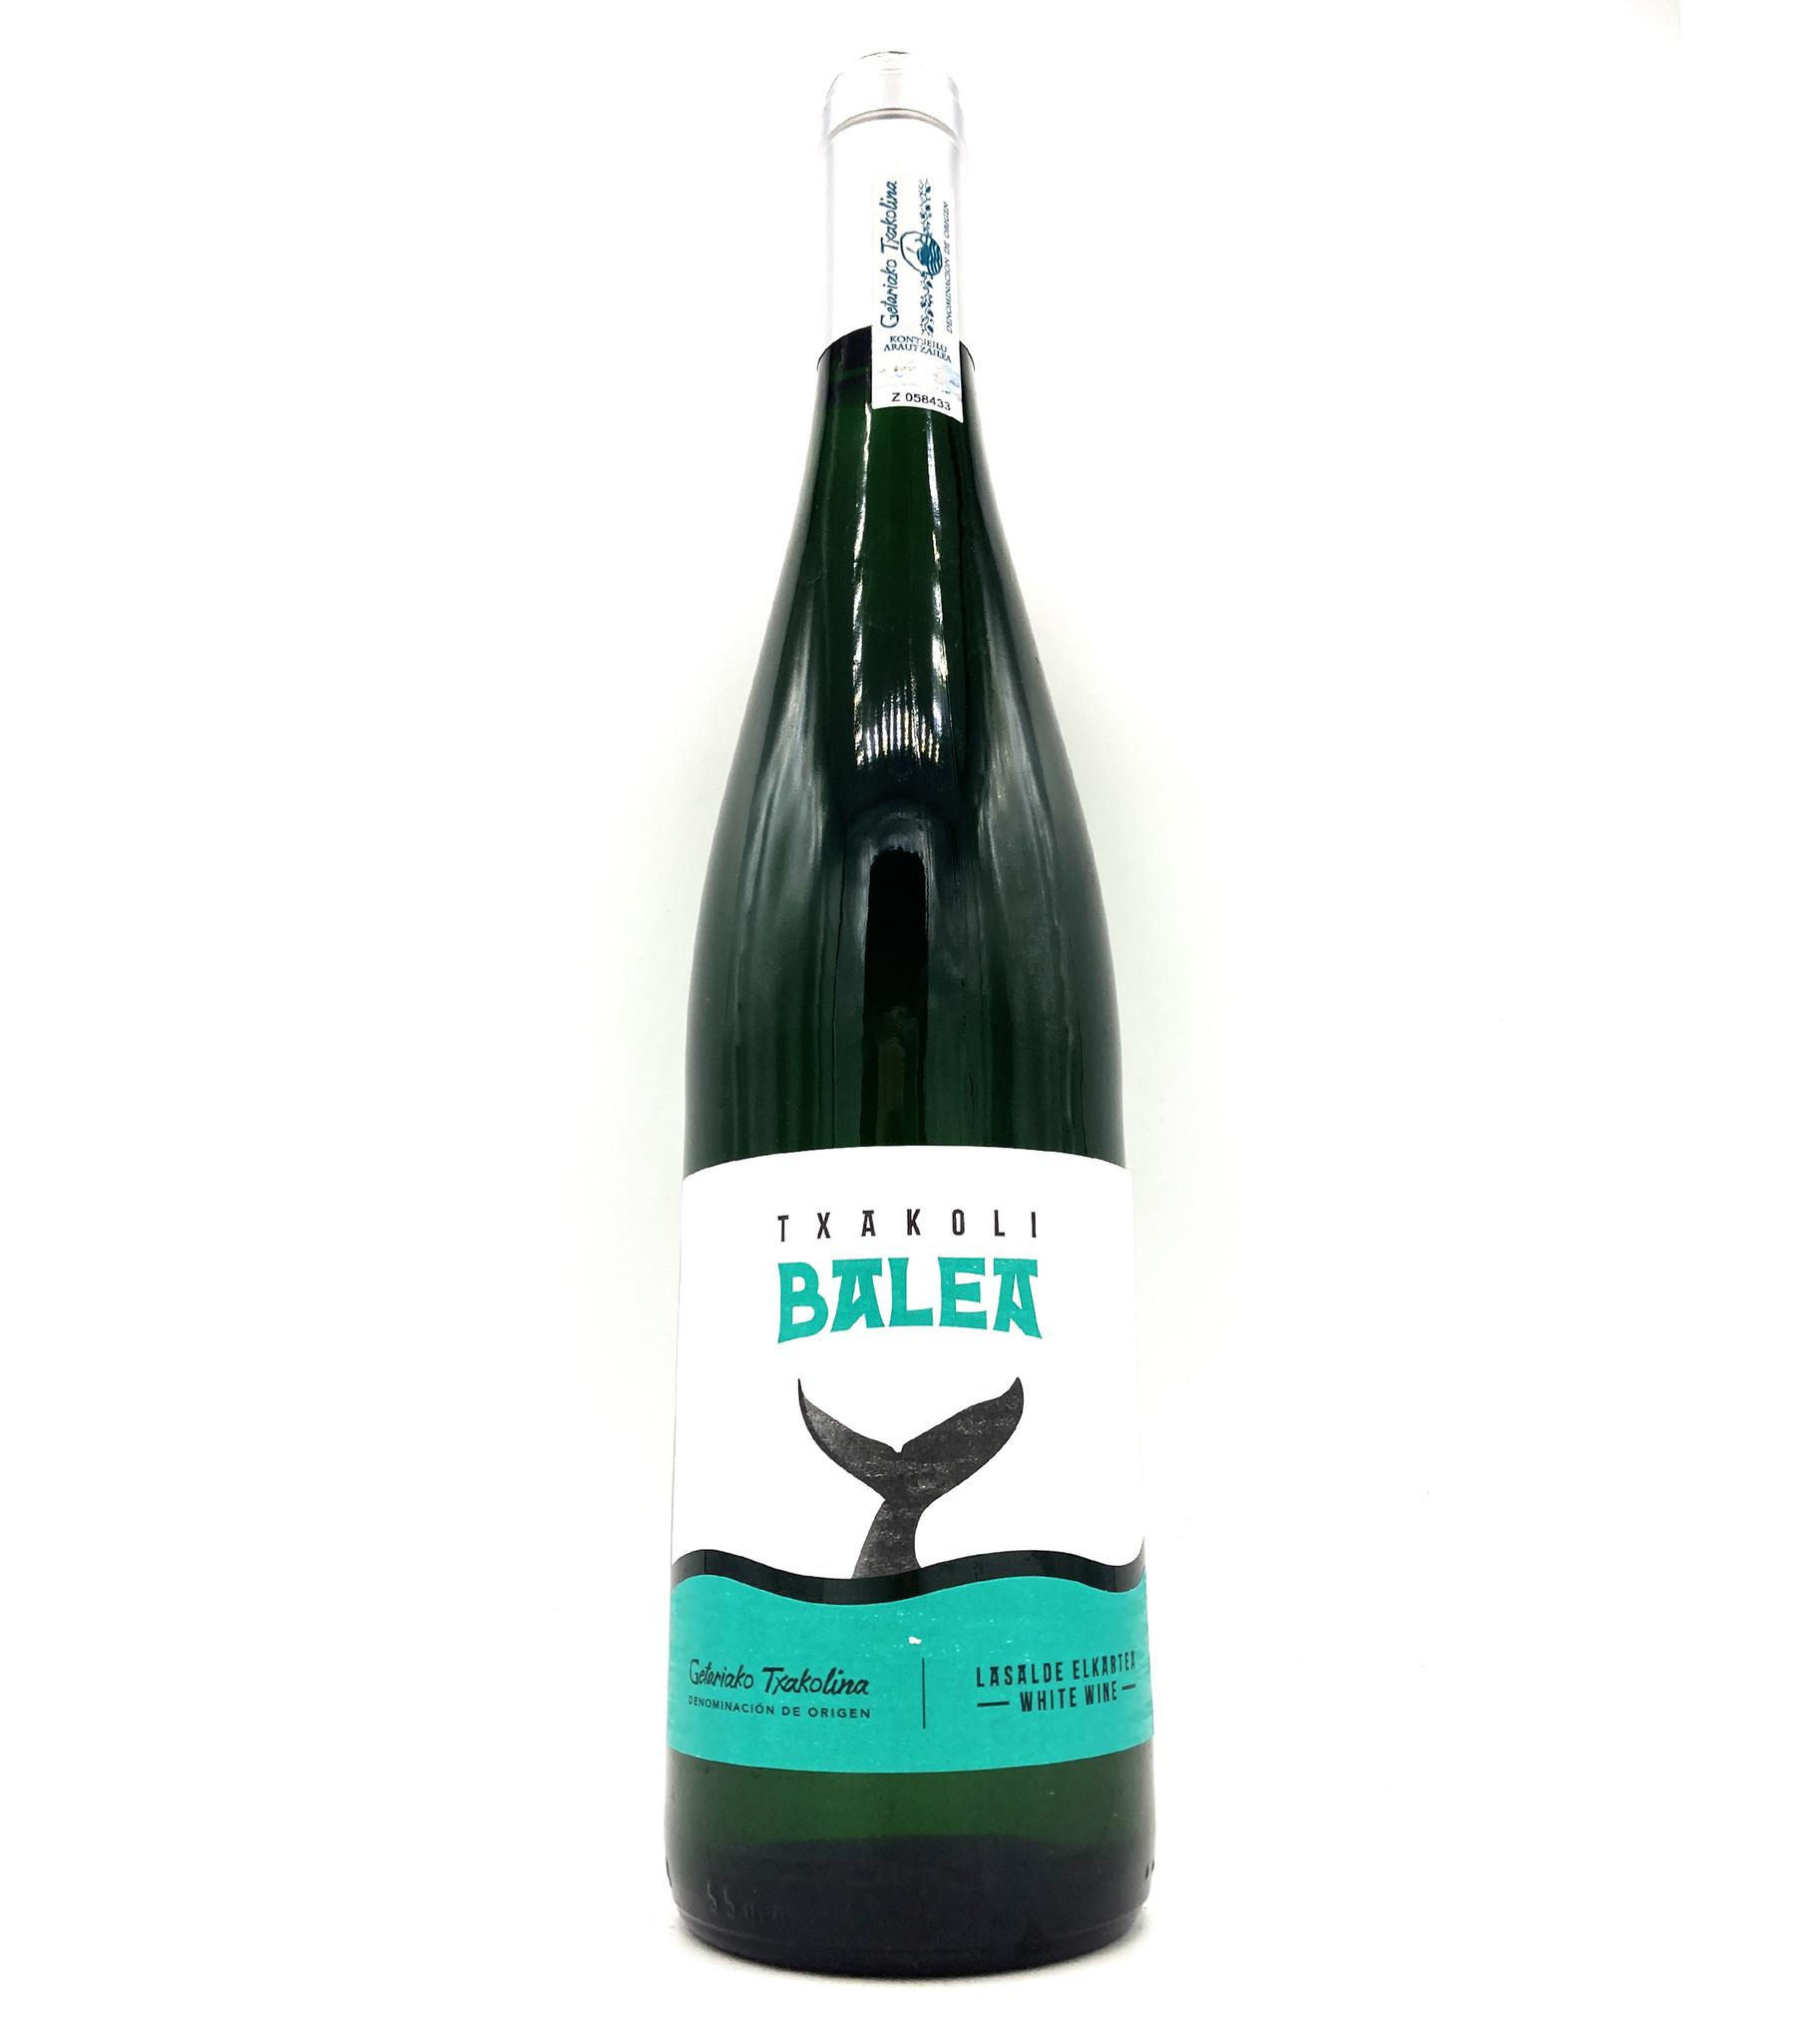 Txakoli 2019 Balea